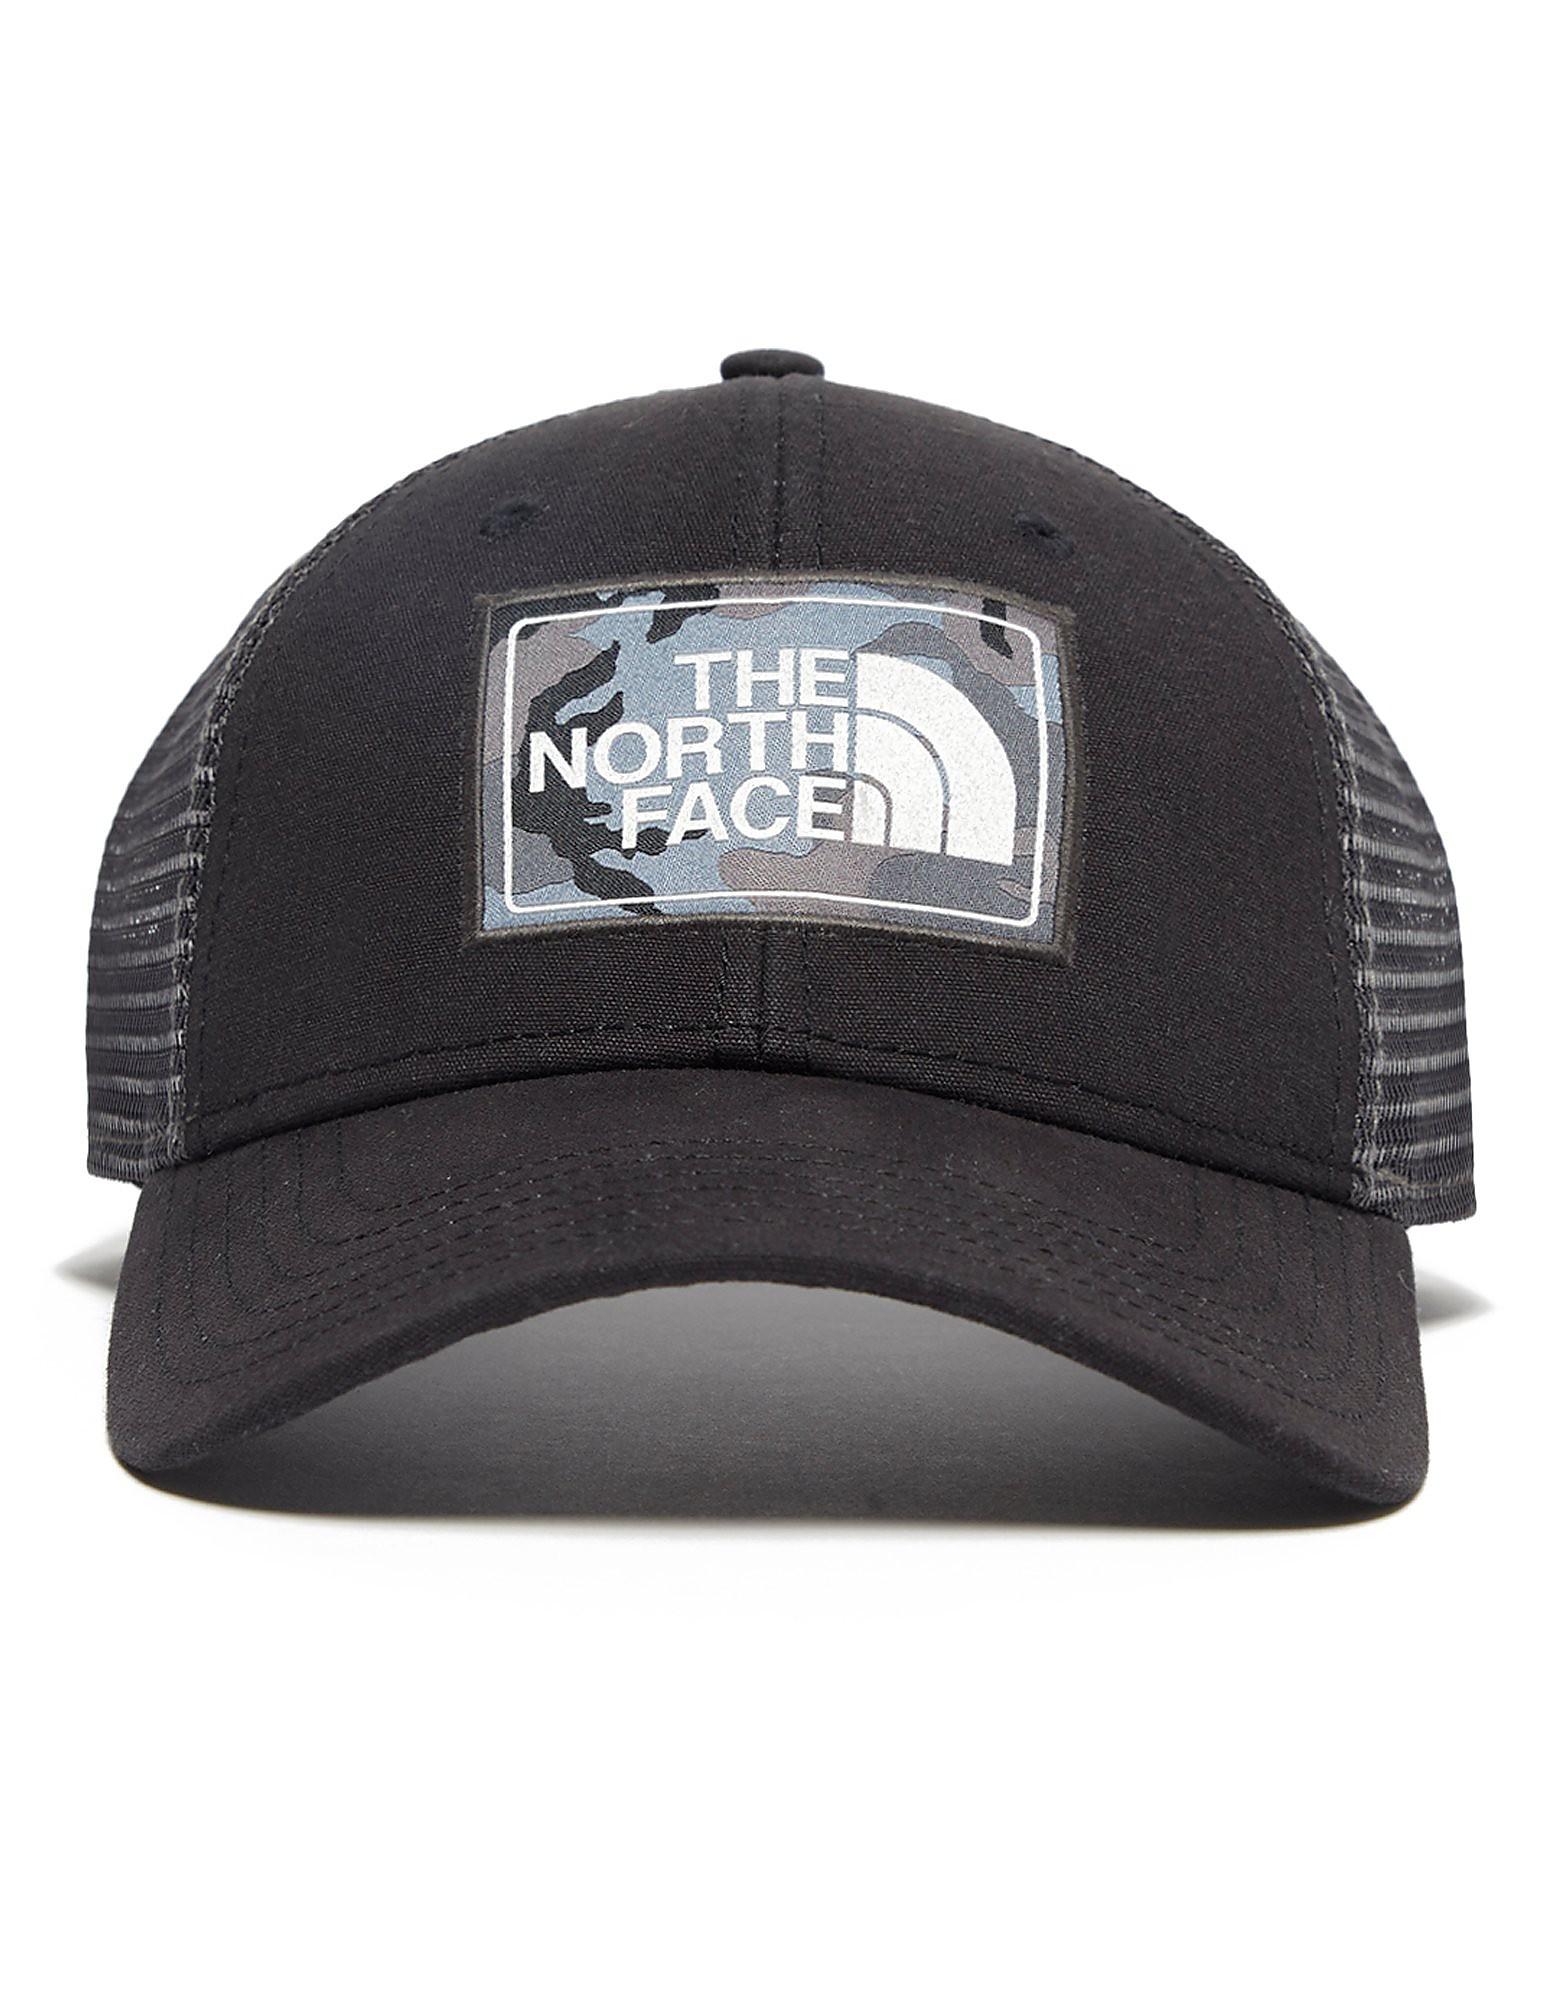 The North Face Mudder Trucker Men's Hat